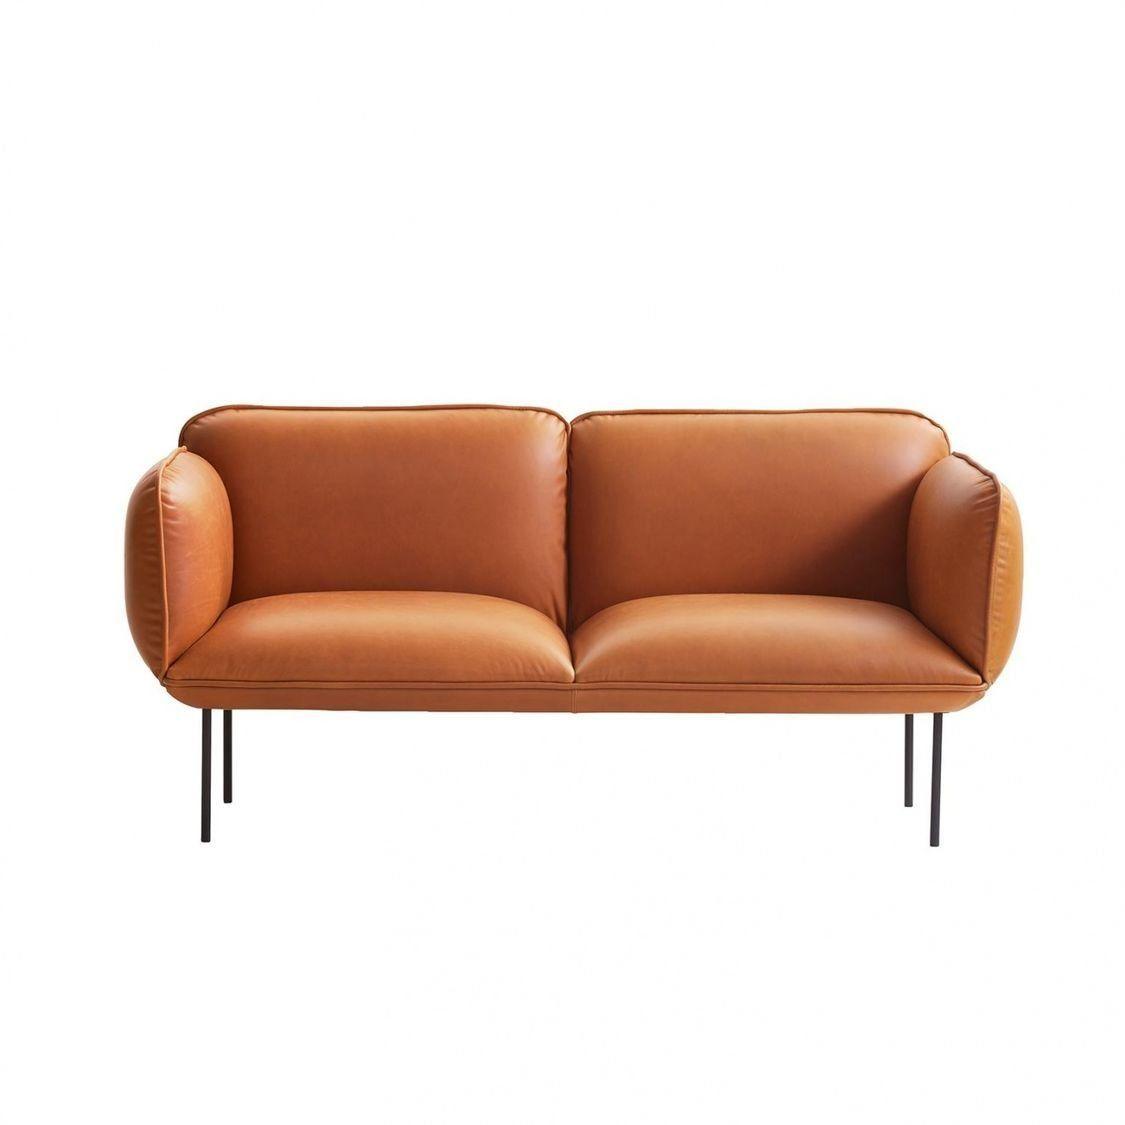 cheap brown leather 2 seater sofa types of sets in kenya nakki woud ambientedirect